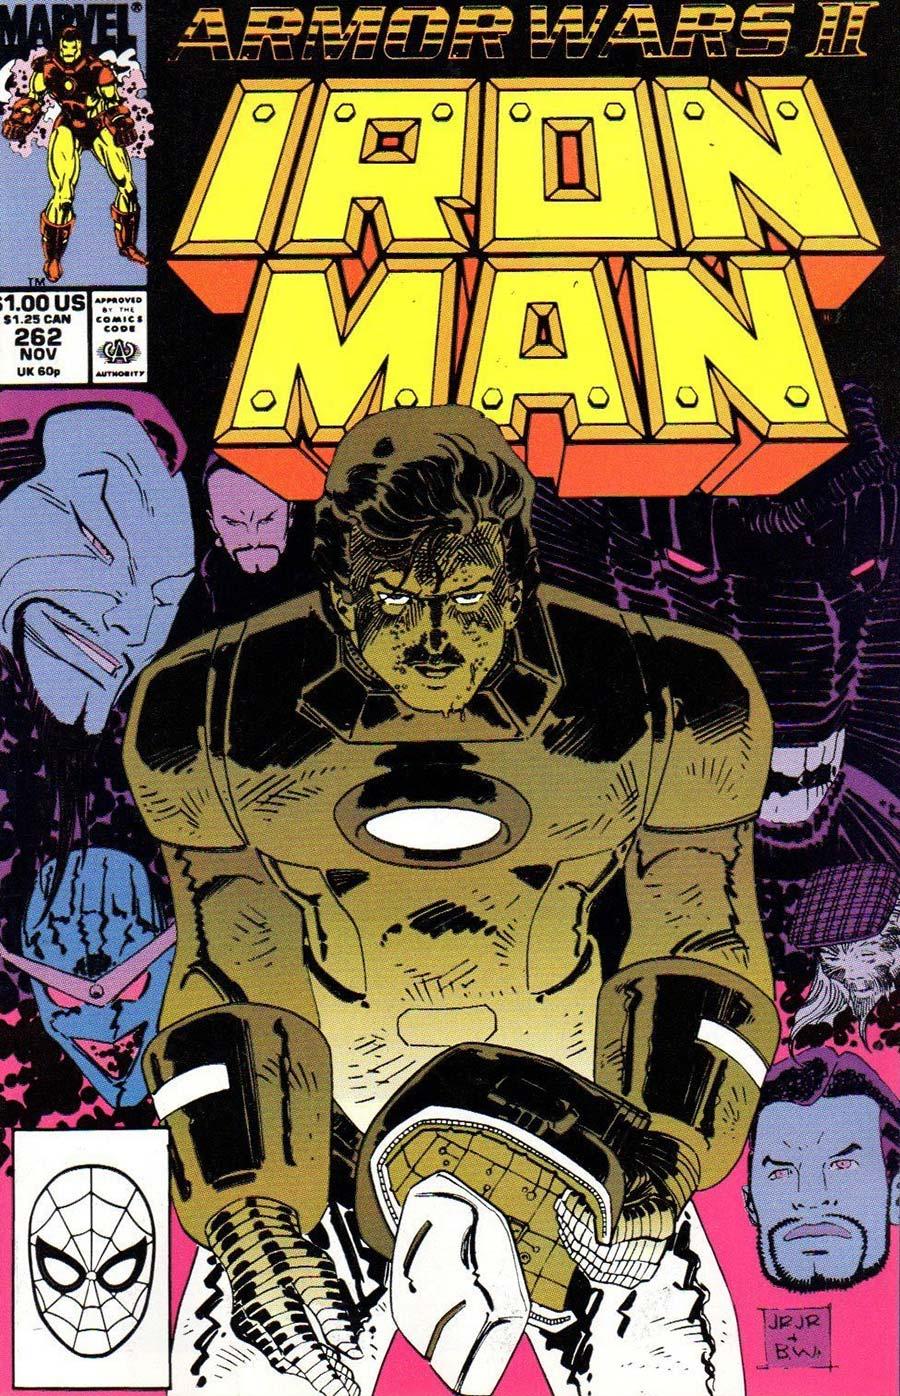 Iron Man (John Byrne)